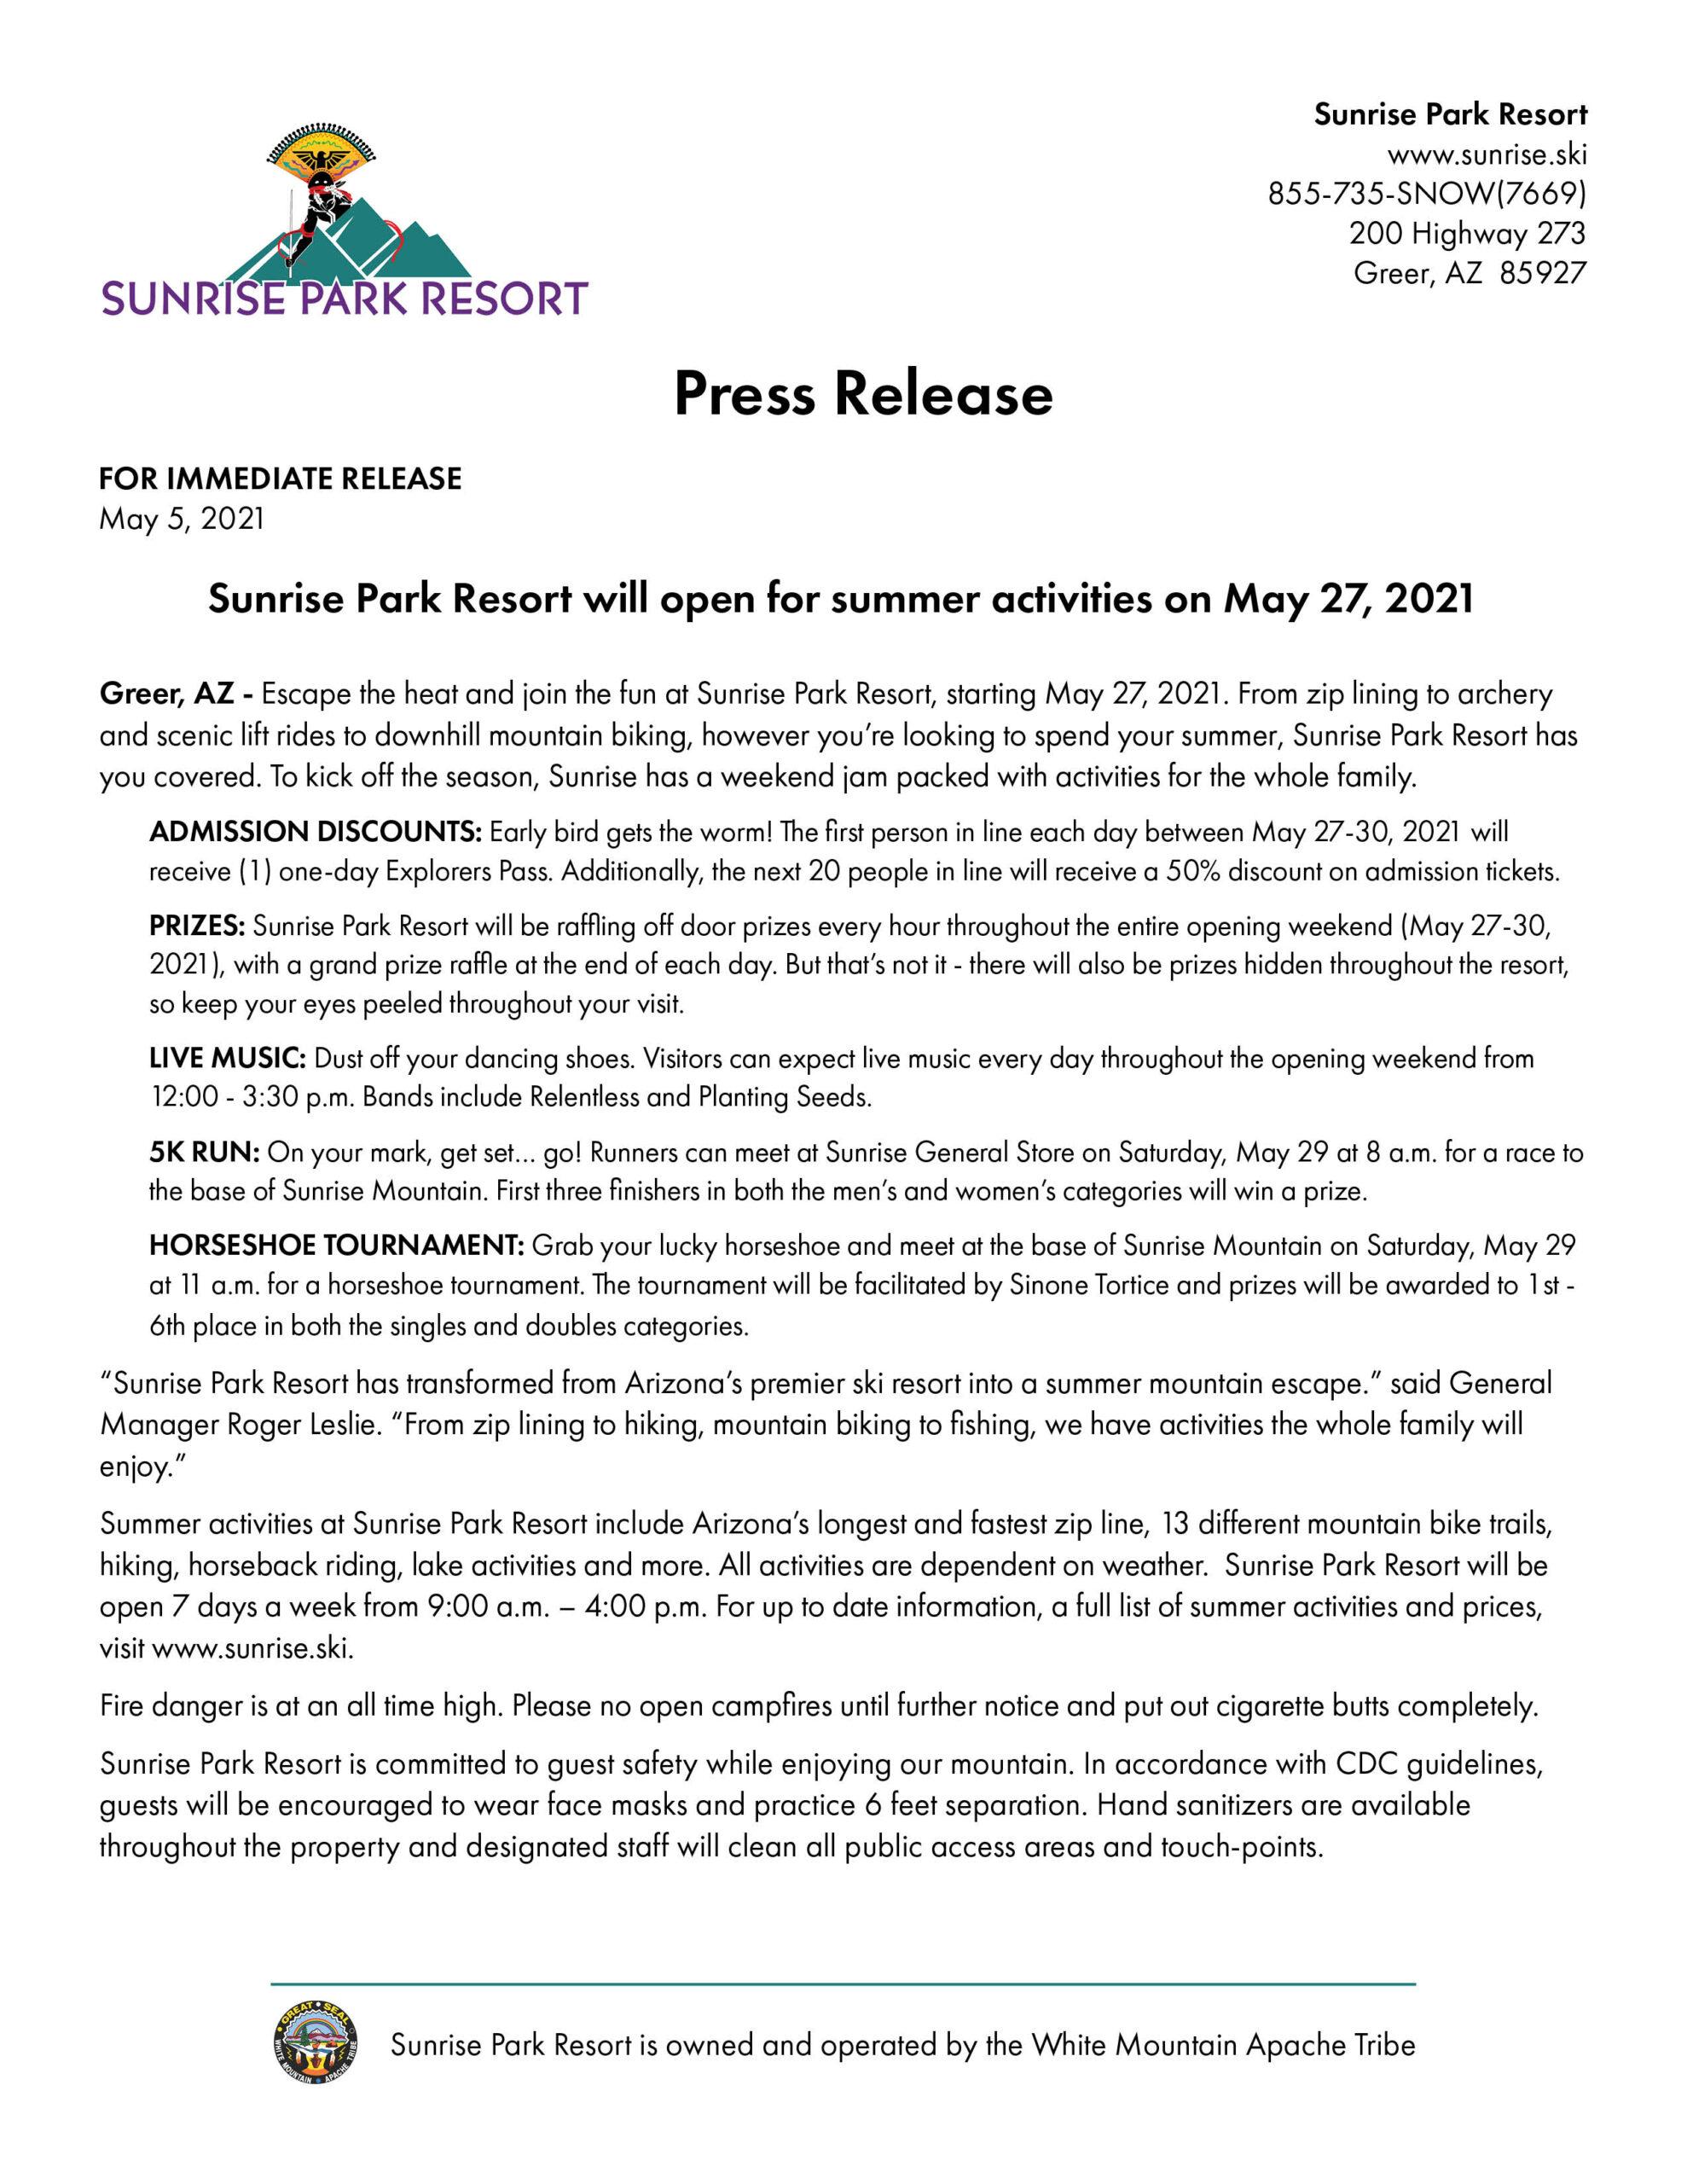 Summer 2021 Opening Press Release